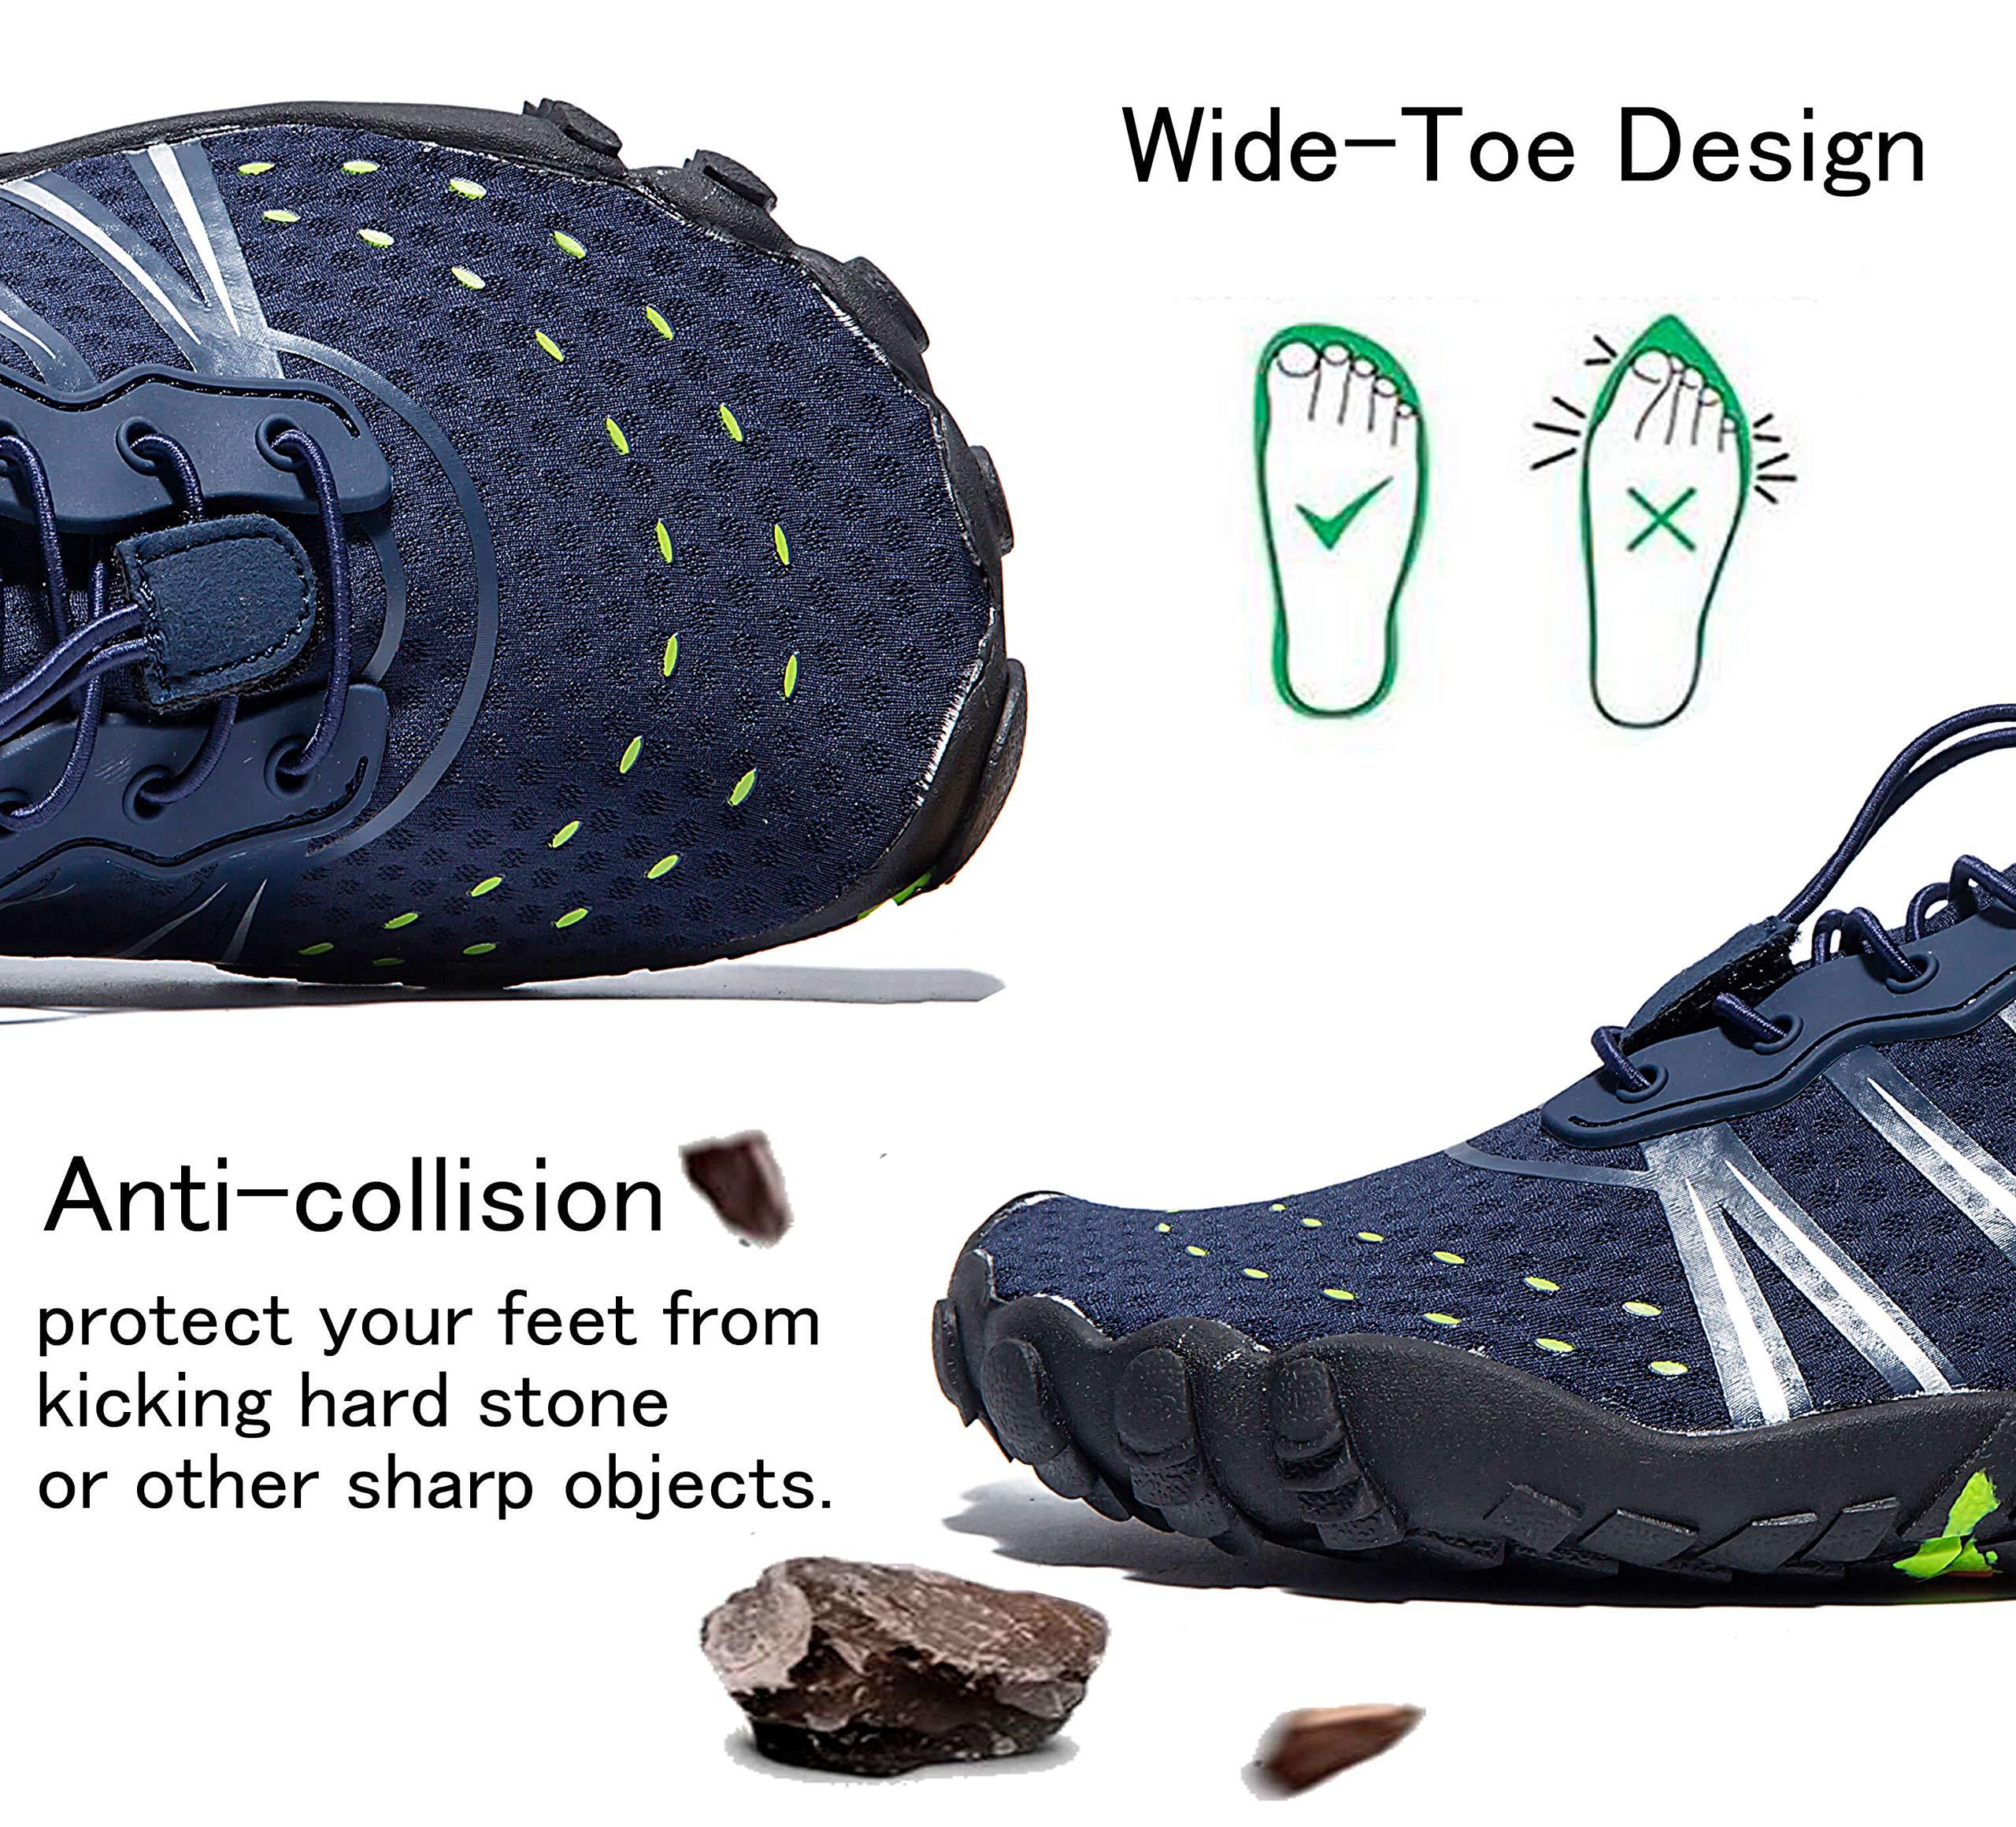 LINGTOM Mens Womens Aqua Water Shoes Quick Dry Barefoot Sports Exercise for Walking Swimming Diving Beach Surf Pool Yoga,Dark Blue 12.5 M US Women / 11 M US Men by LINGTOM (Image #4)